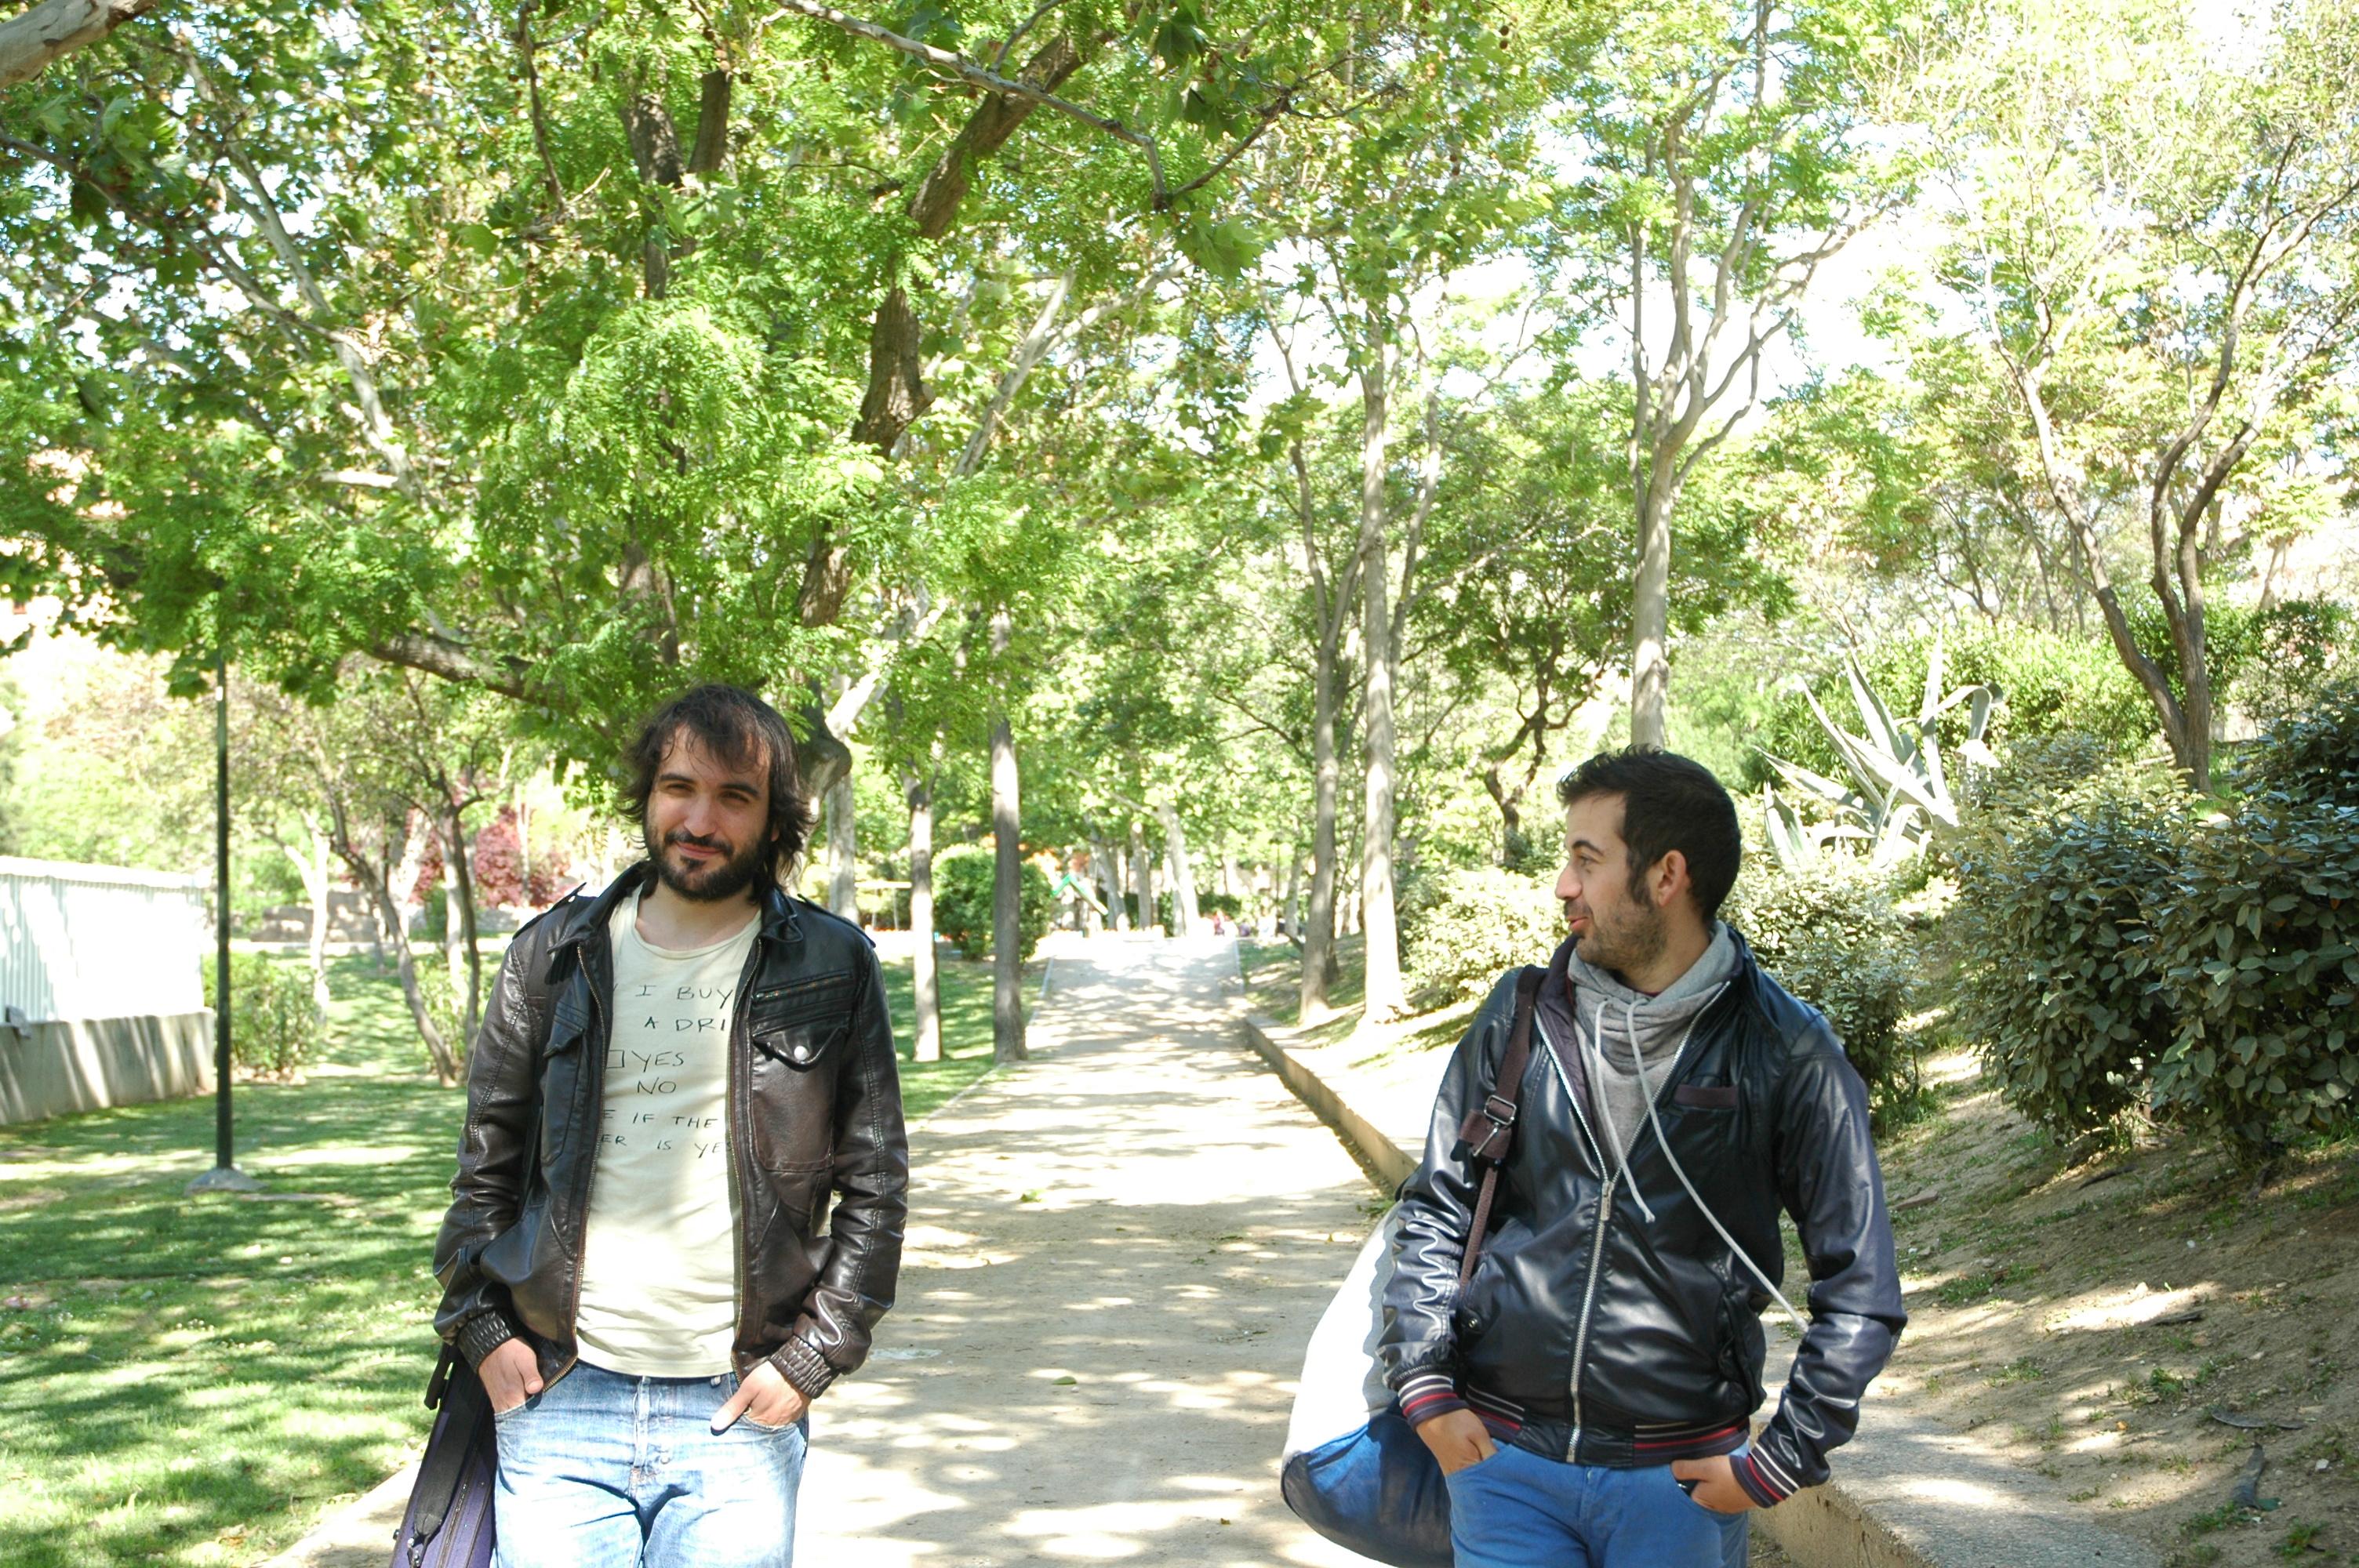 Book_1_David_Pallás_Gozalo_Parque_68